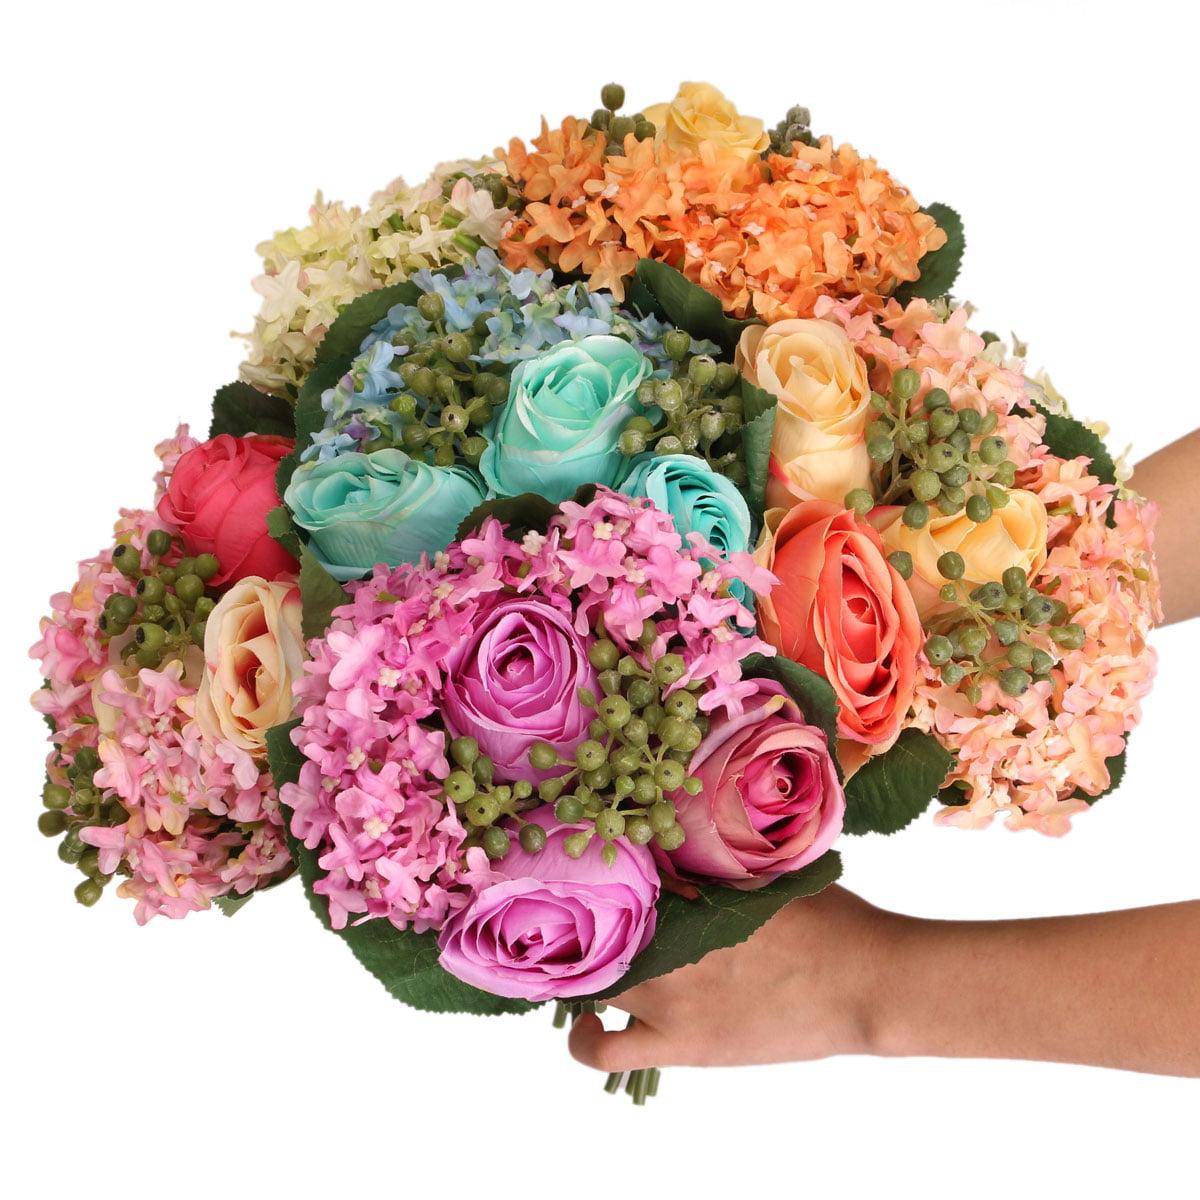 1 Bouquet Artificial decoration Rose Silk Hydrangea Flowers Bridal Home Party Wedding Decor